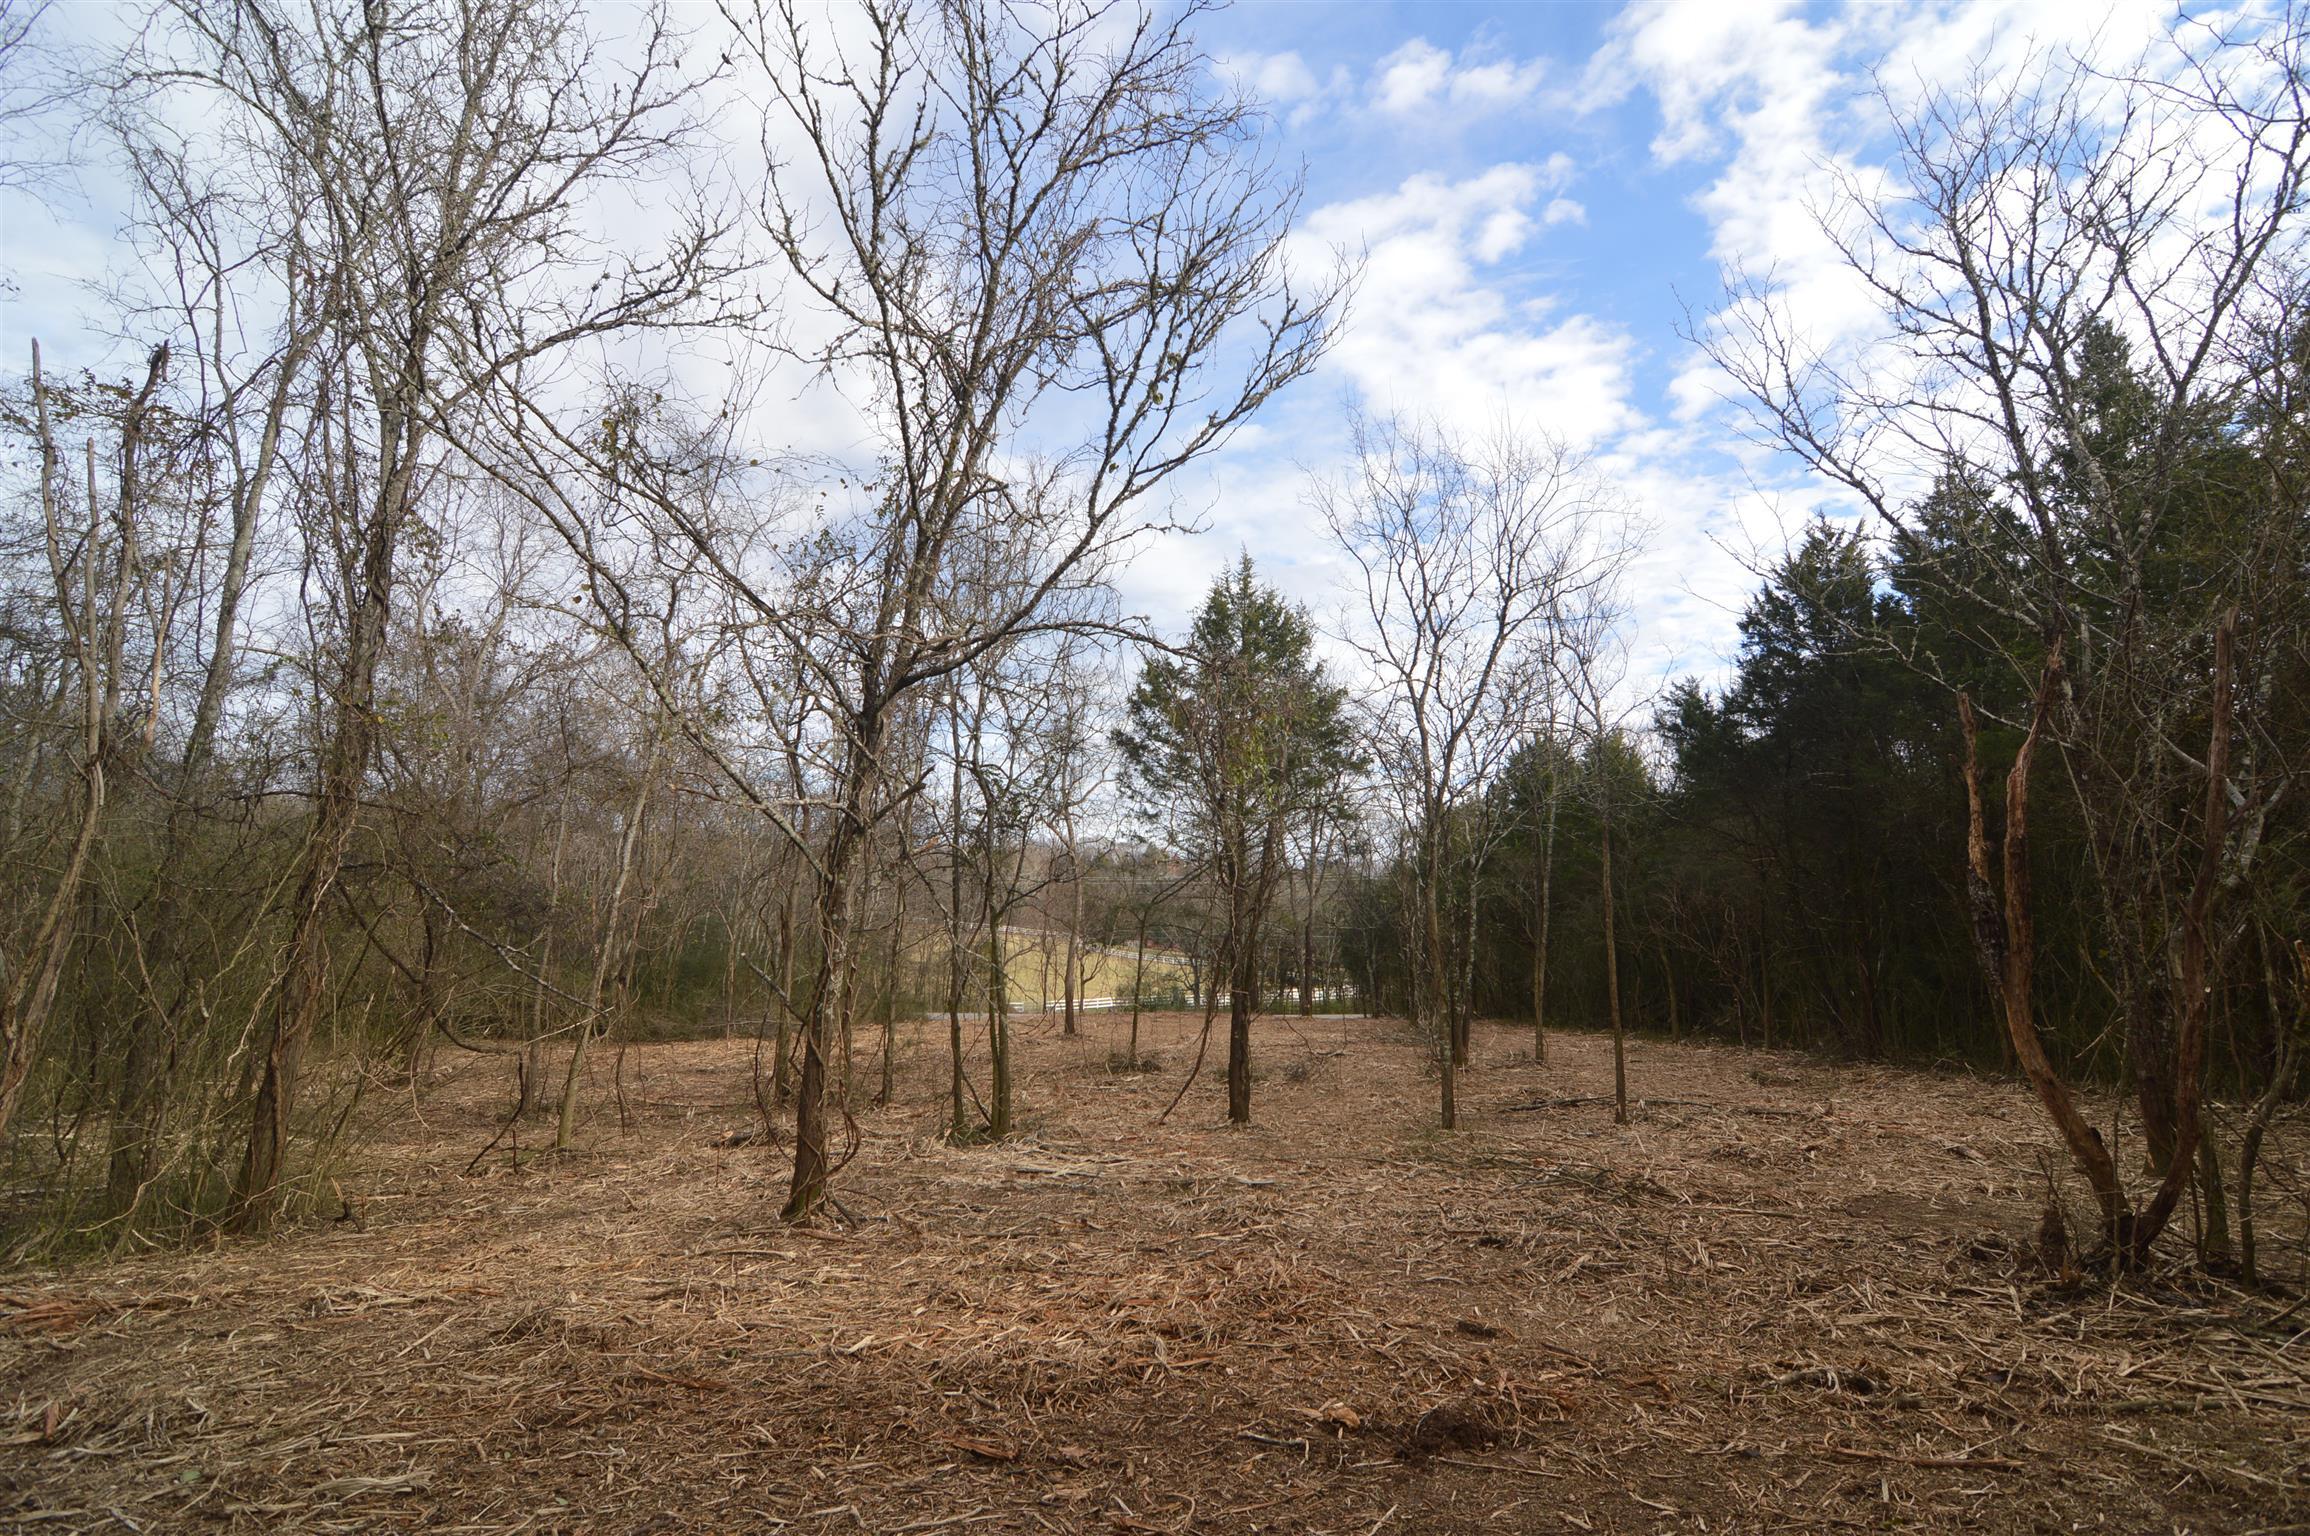 0 Greenhill South Rd, Mount Juliet, TN 37122